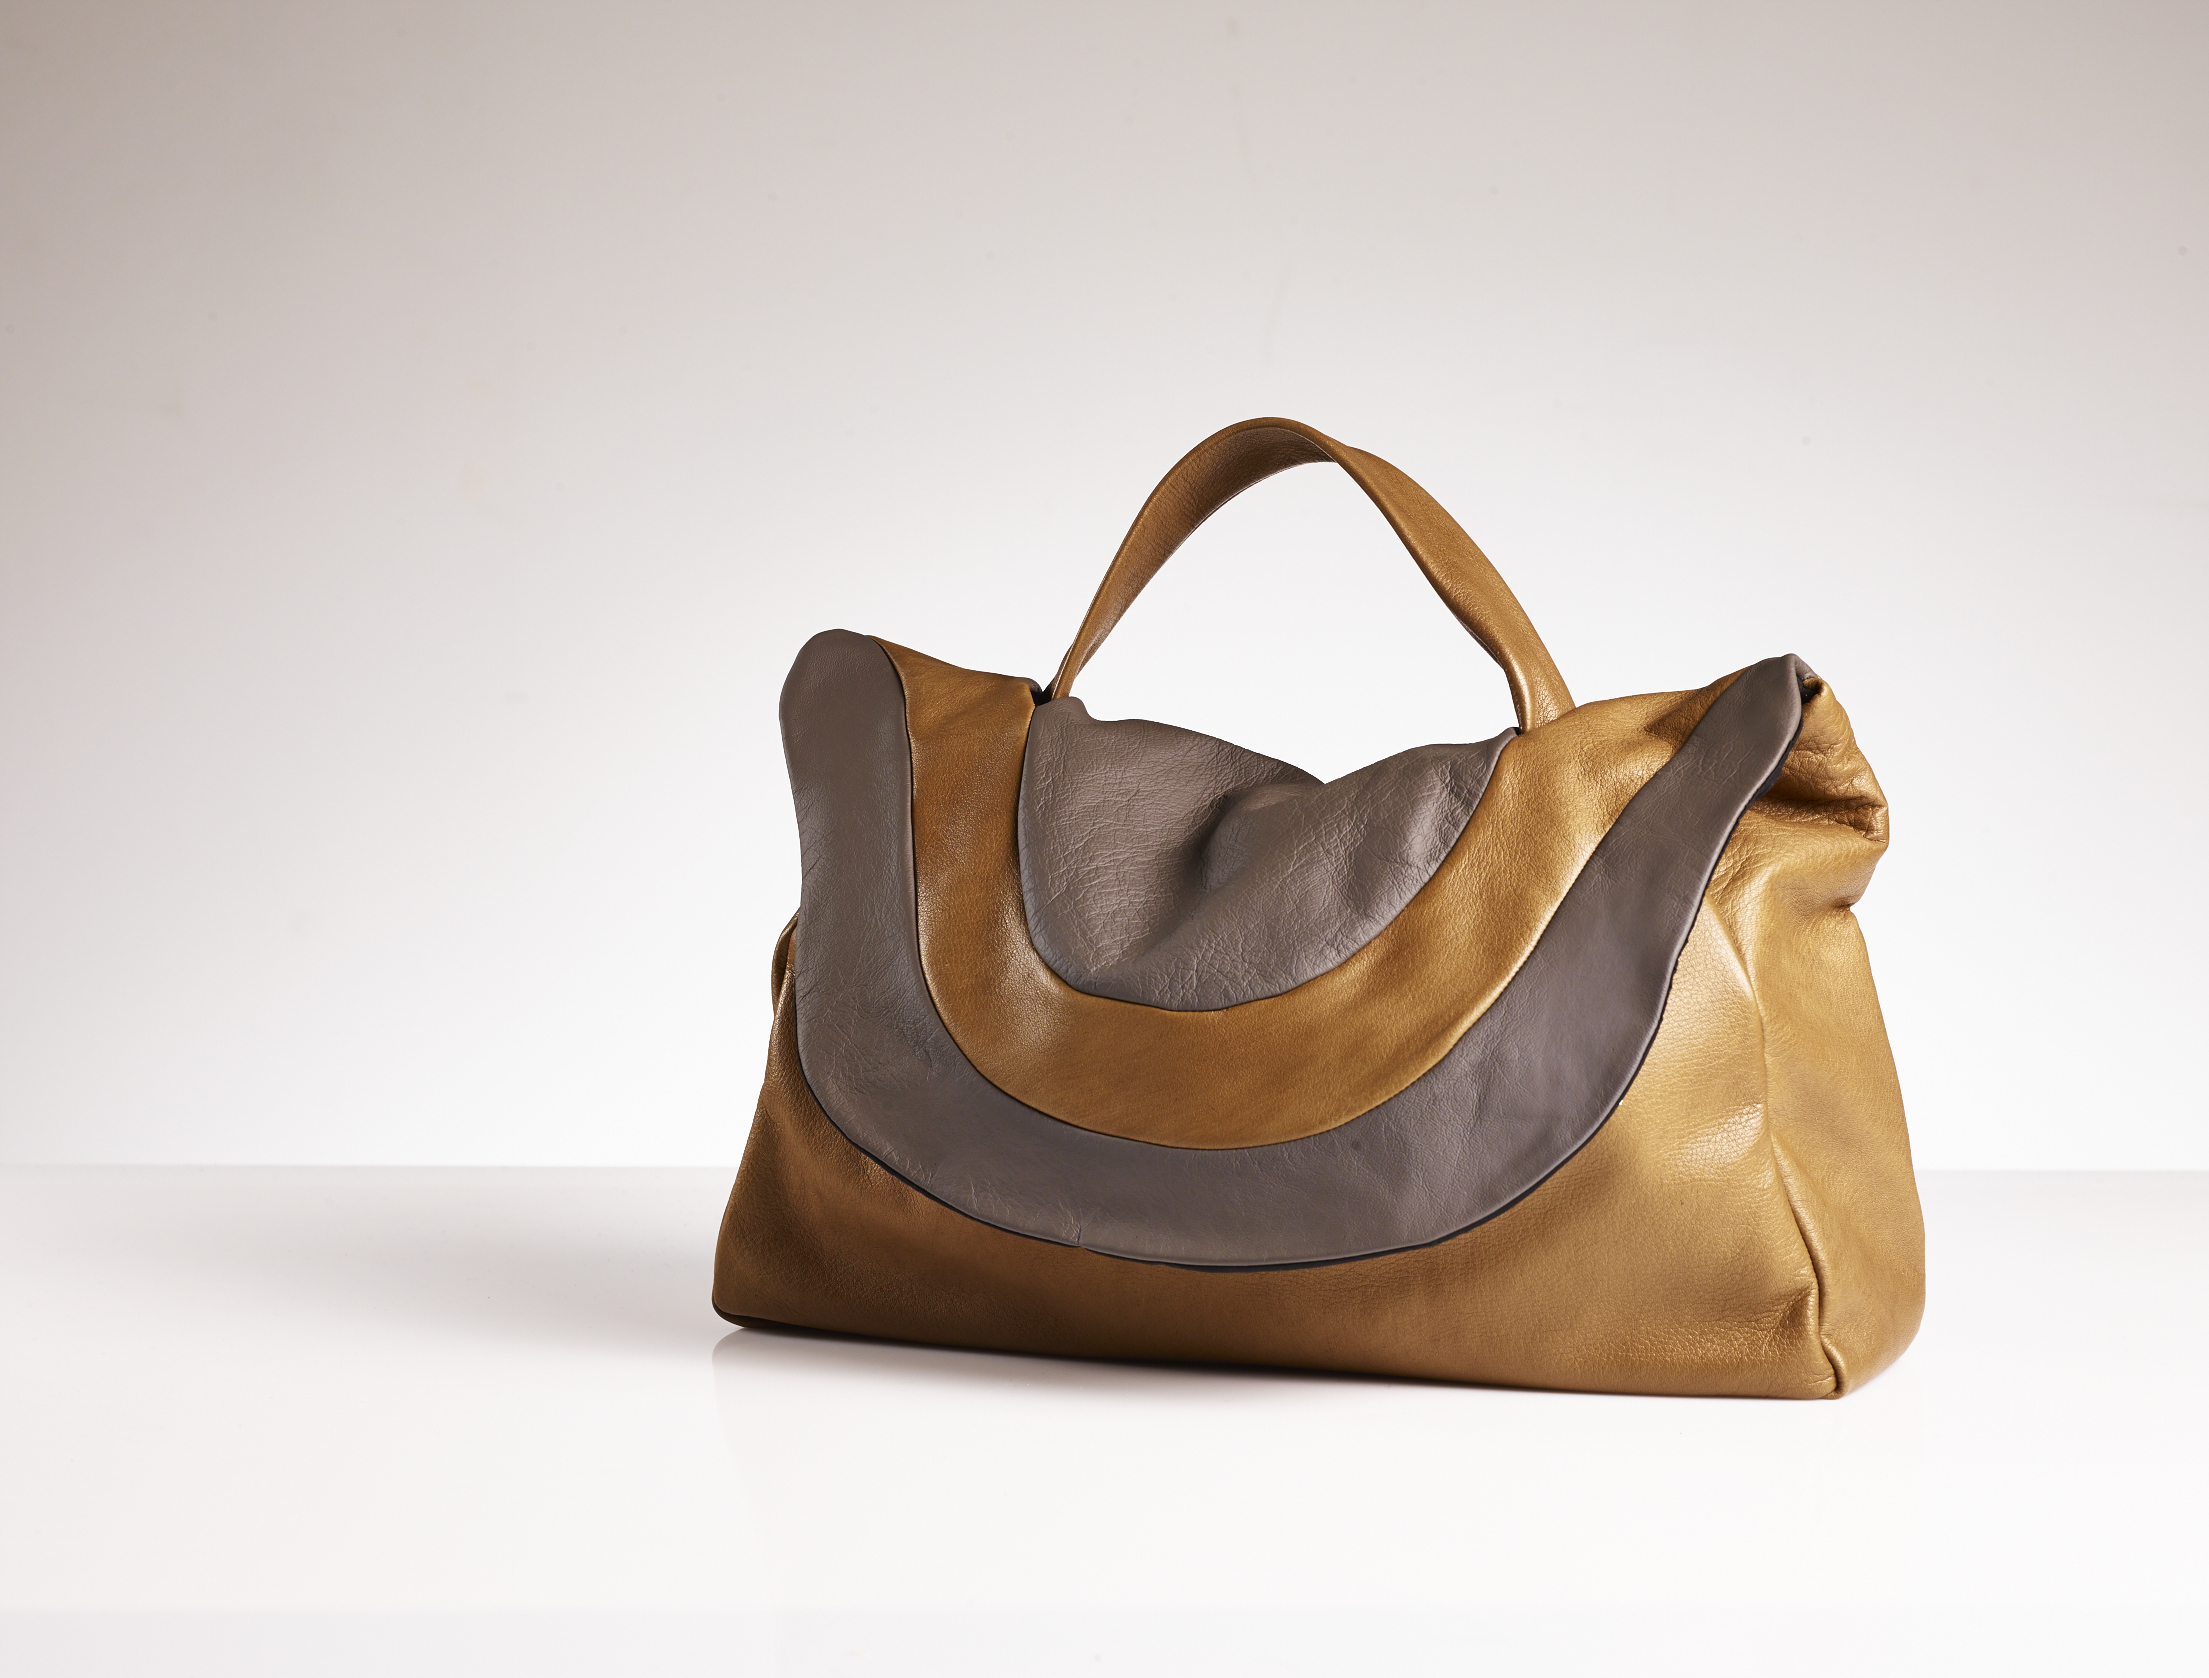 Strehlow handtasche_25978.jpg